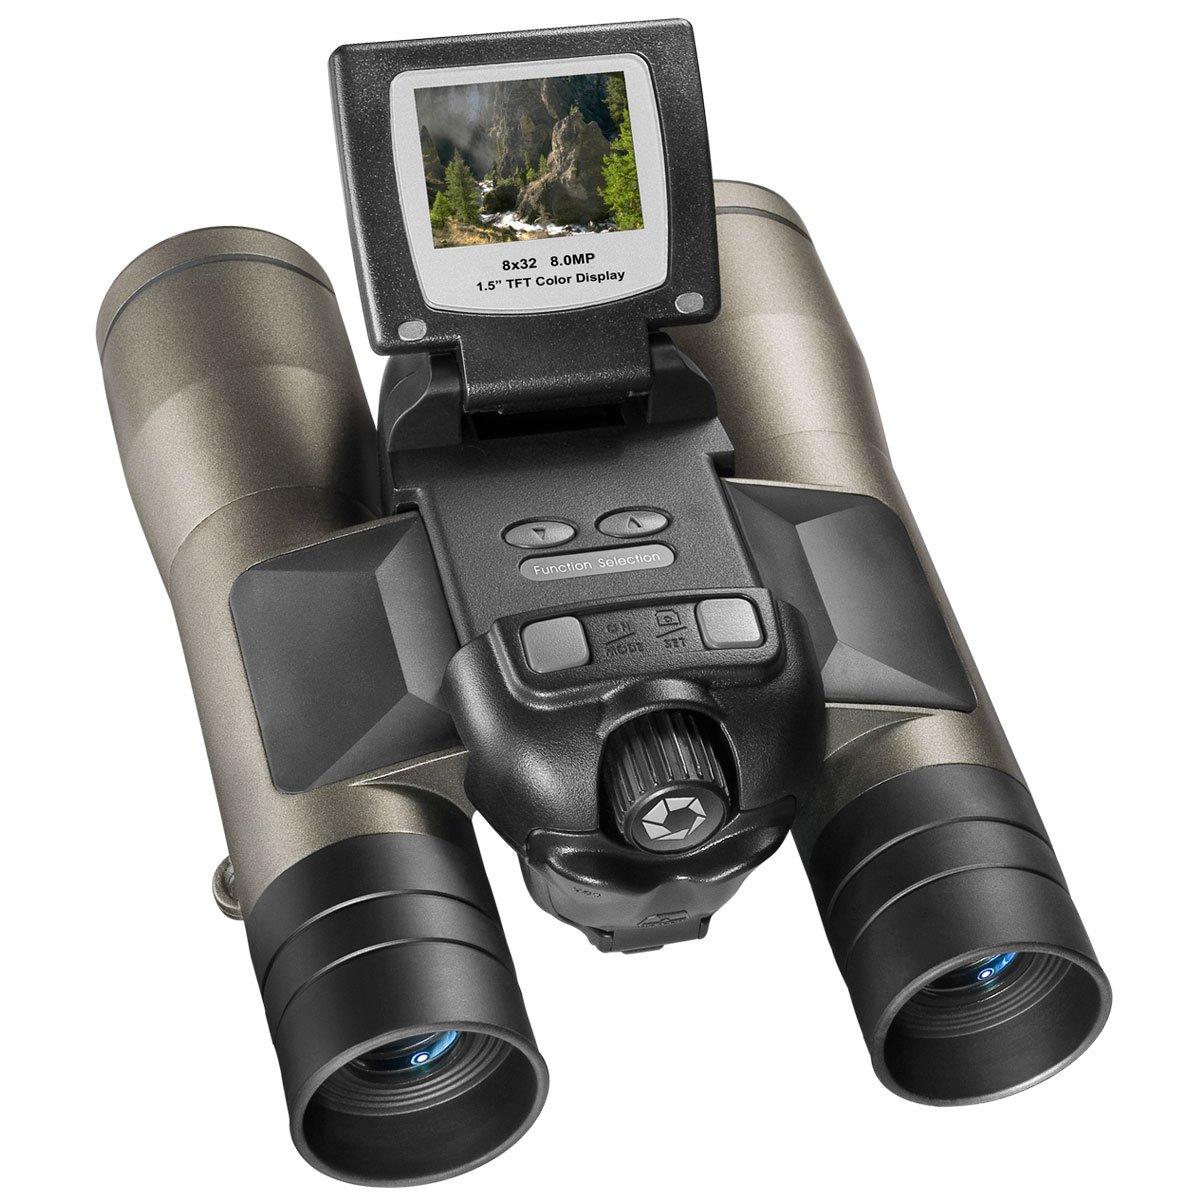 BARSKA 8x32 Binocular & Built-In 8.0 MP Digital Camera by BARSKA